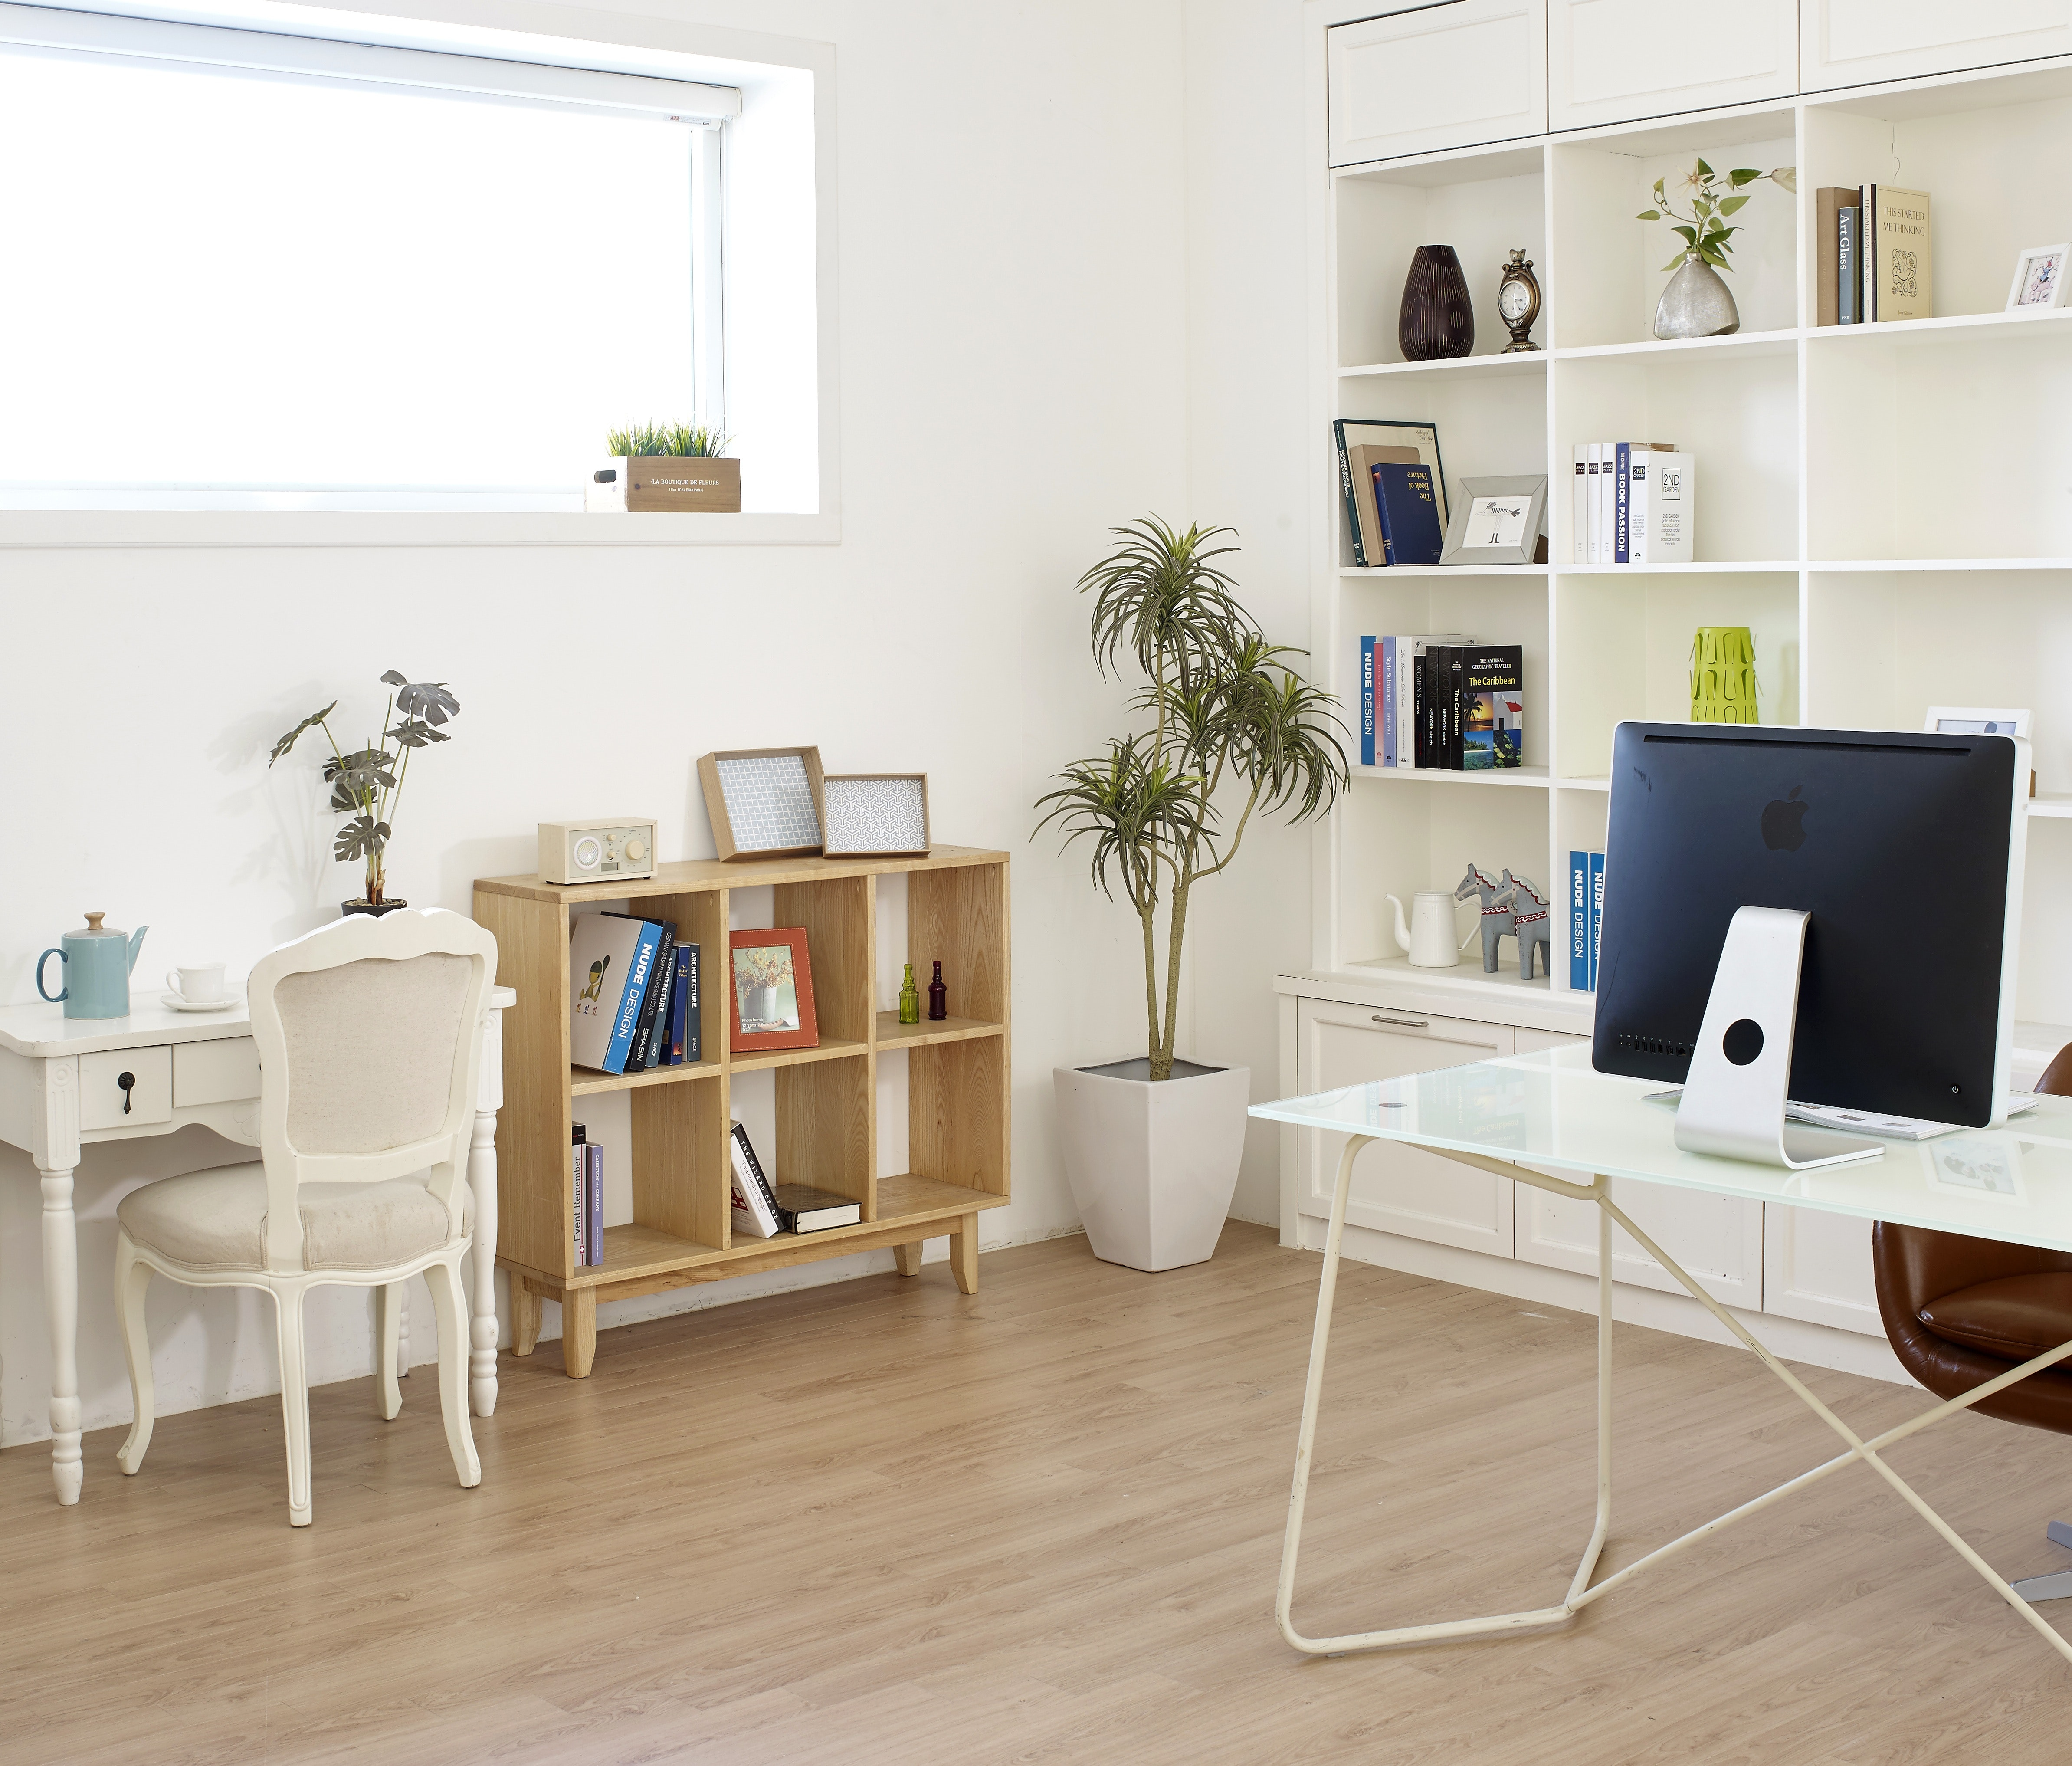 Study Room Decoration Interior Design Ideas For Study Room